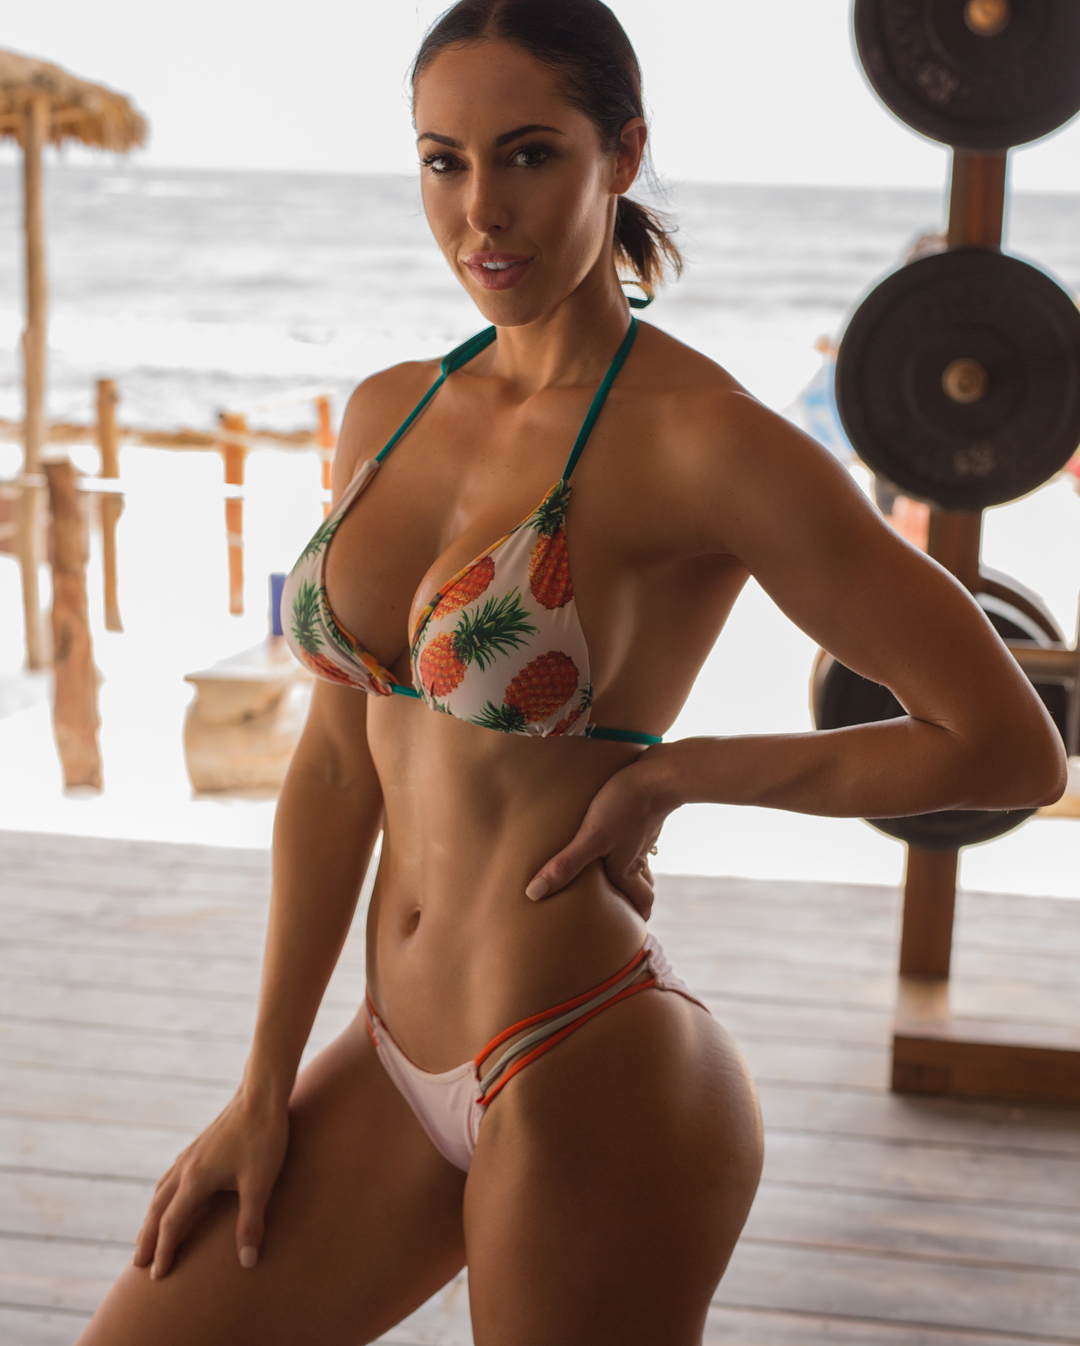 Pictures Hope Beel nudes (41 photo), Tits, Sideboobs, Instagram, lingerie 2015